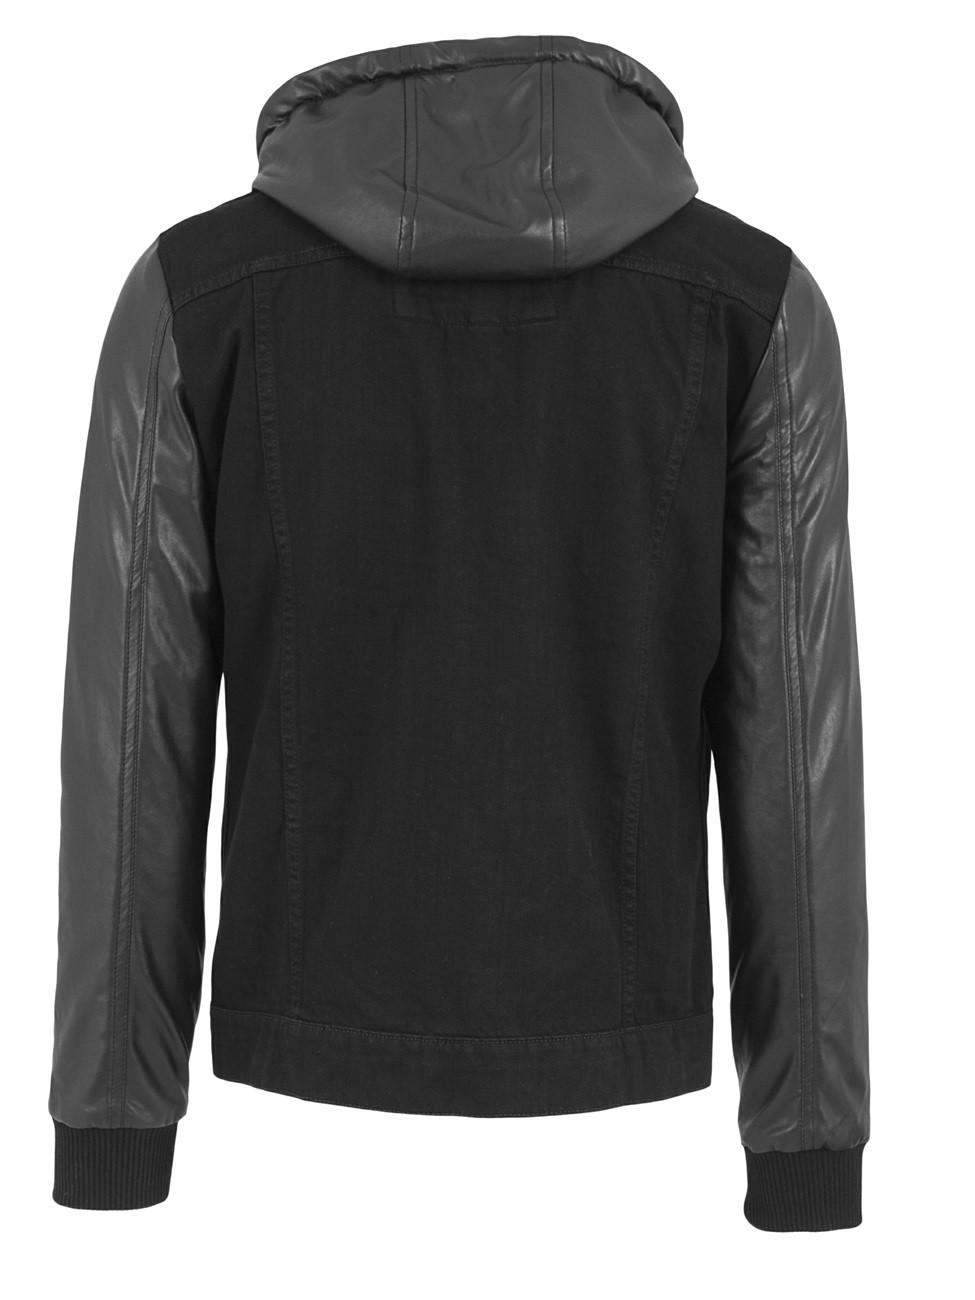 urban classics herren hooded denim leather imitation jacket kaufen jeans direct de. Black Bedroom Furniture Sets. Home Design Ideas